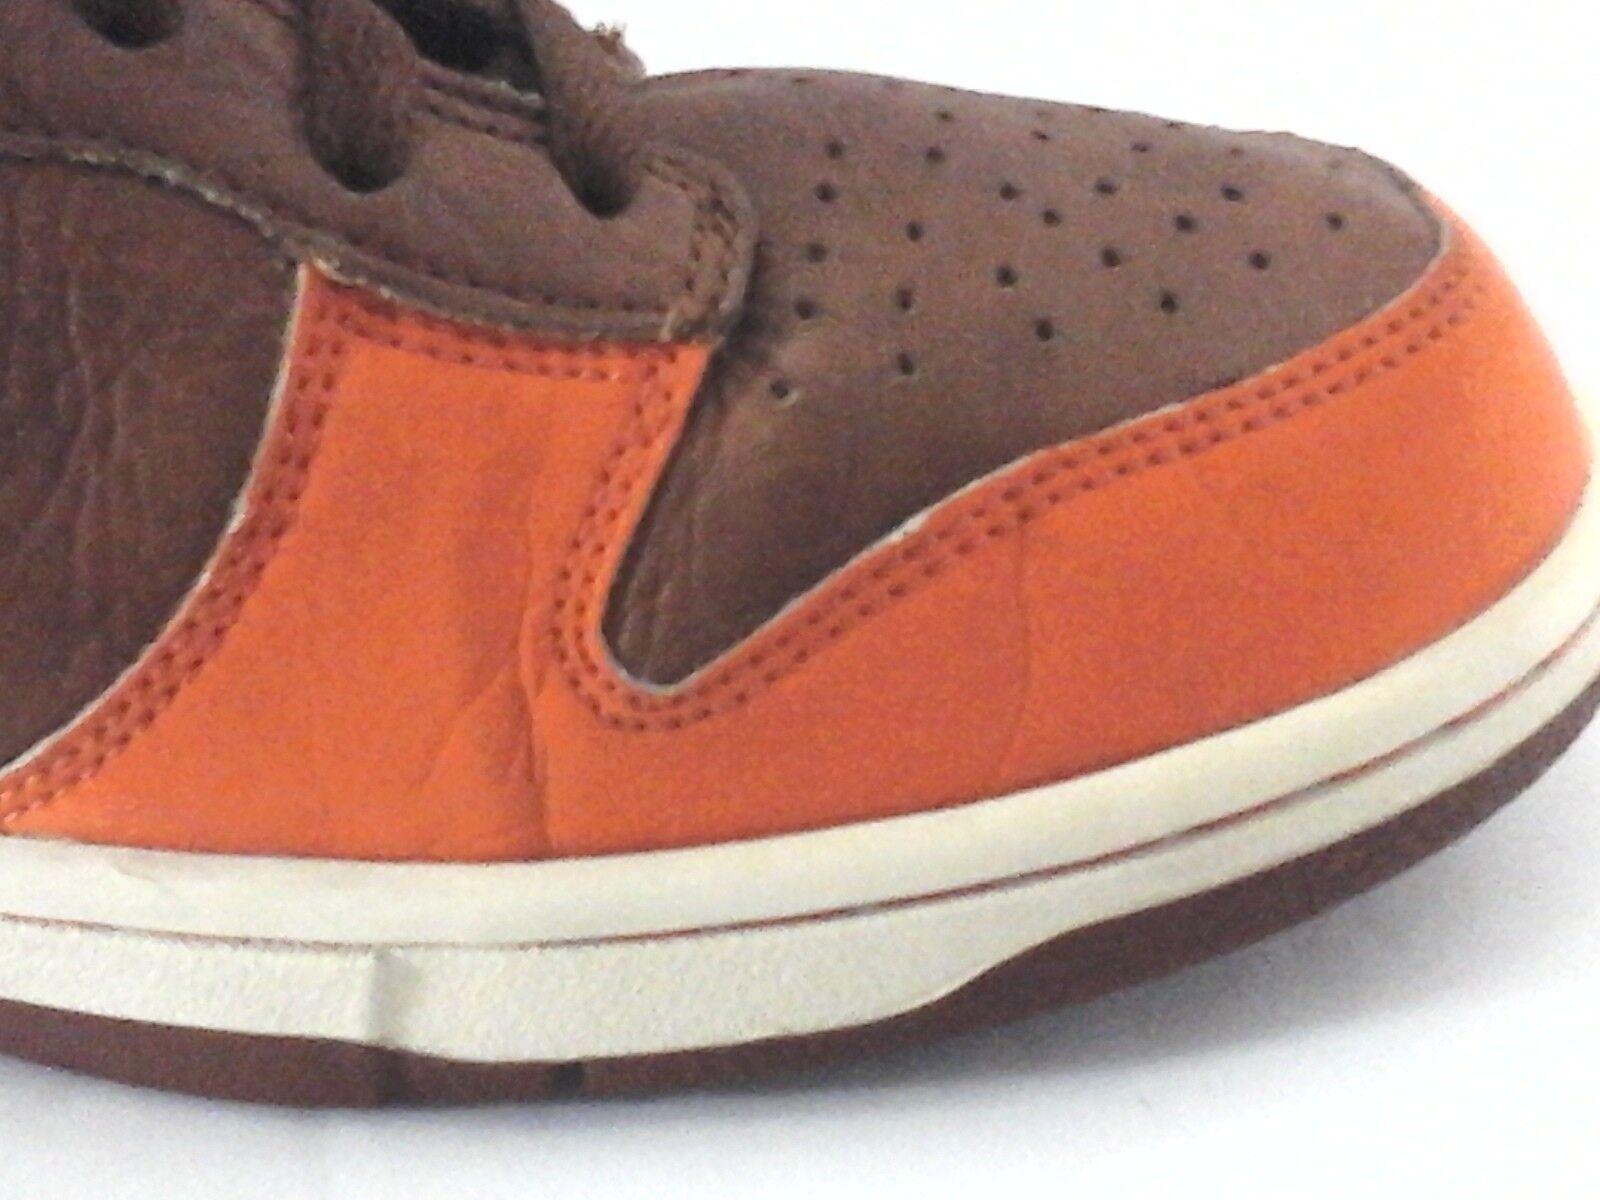 NIKE Schuhes 312786-891 312786-891 312786-891 Braun/Gray/Orange High Top Sneakers  Herren US 10.5/44.5 RARE 8ef005